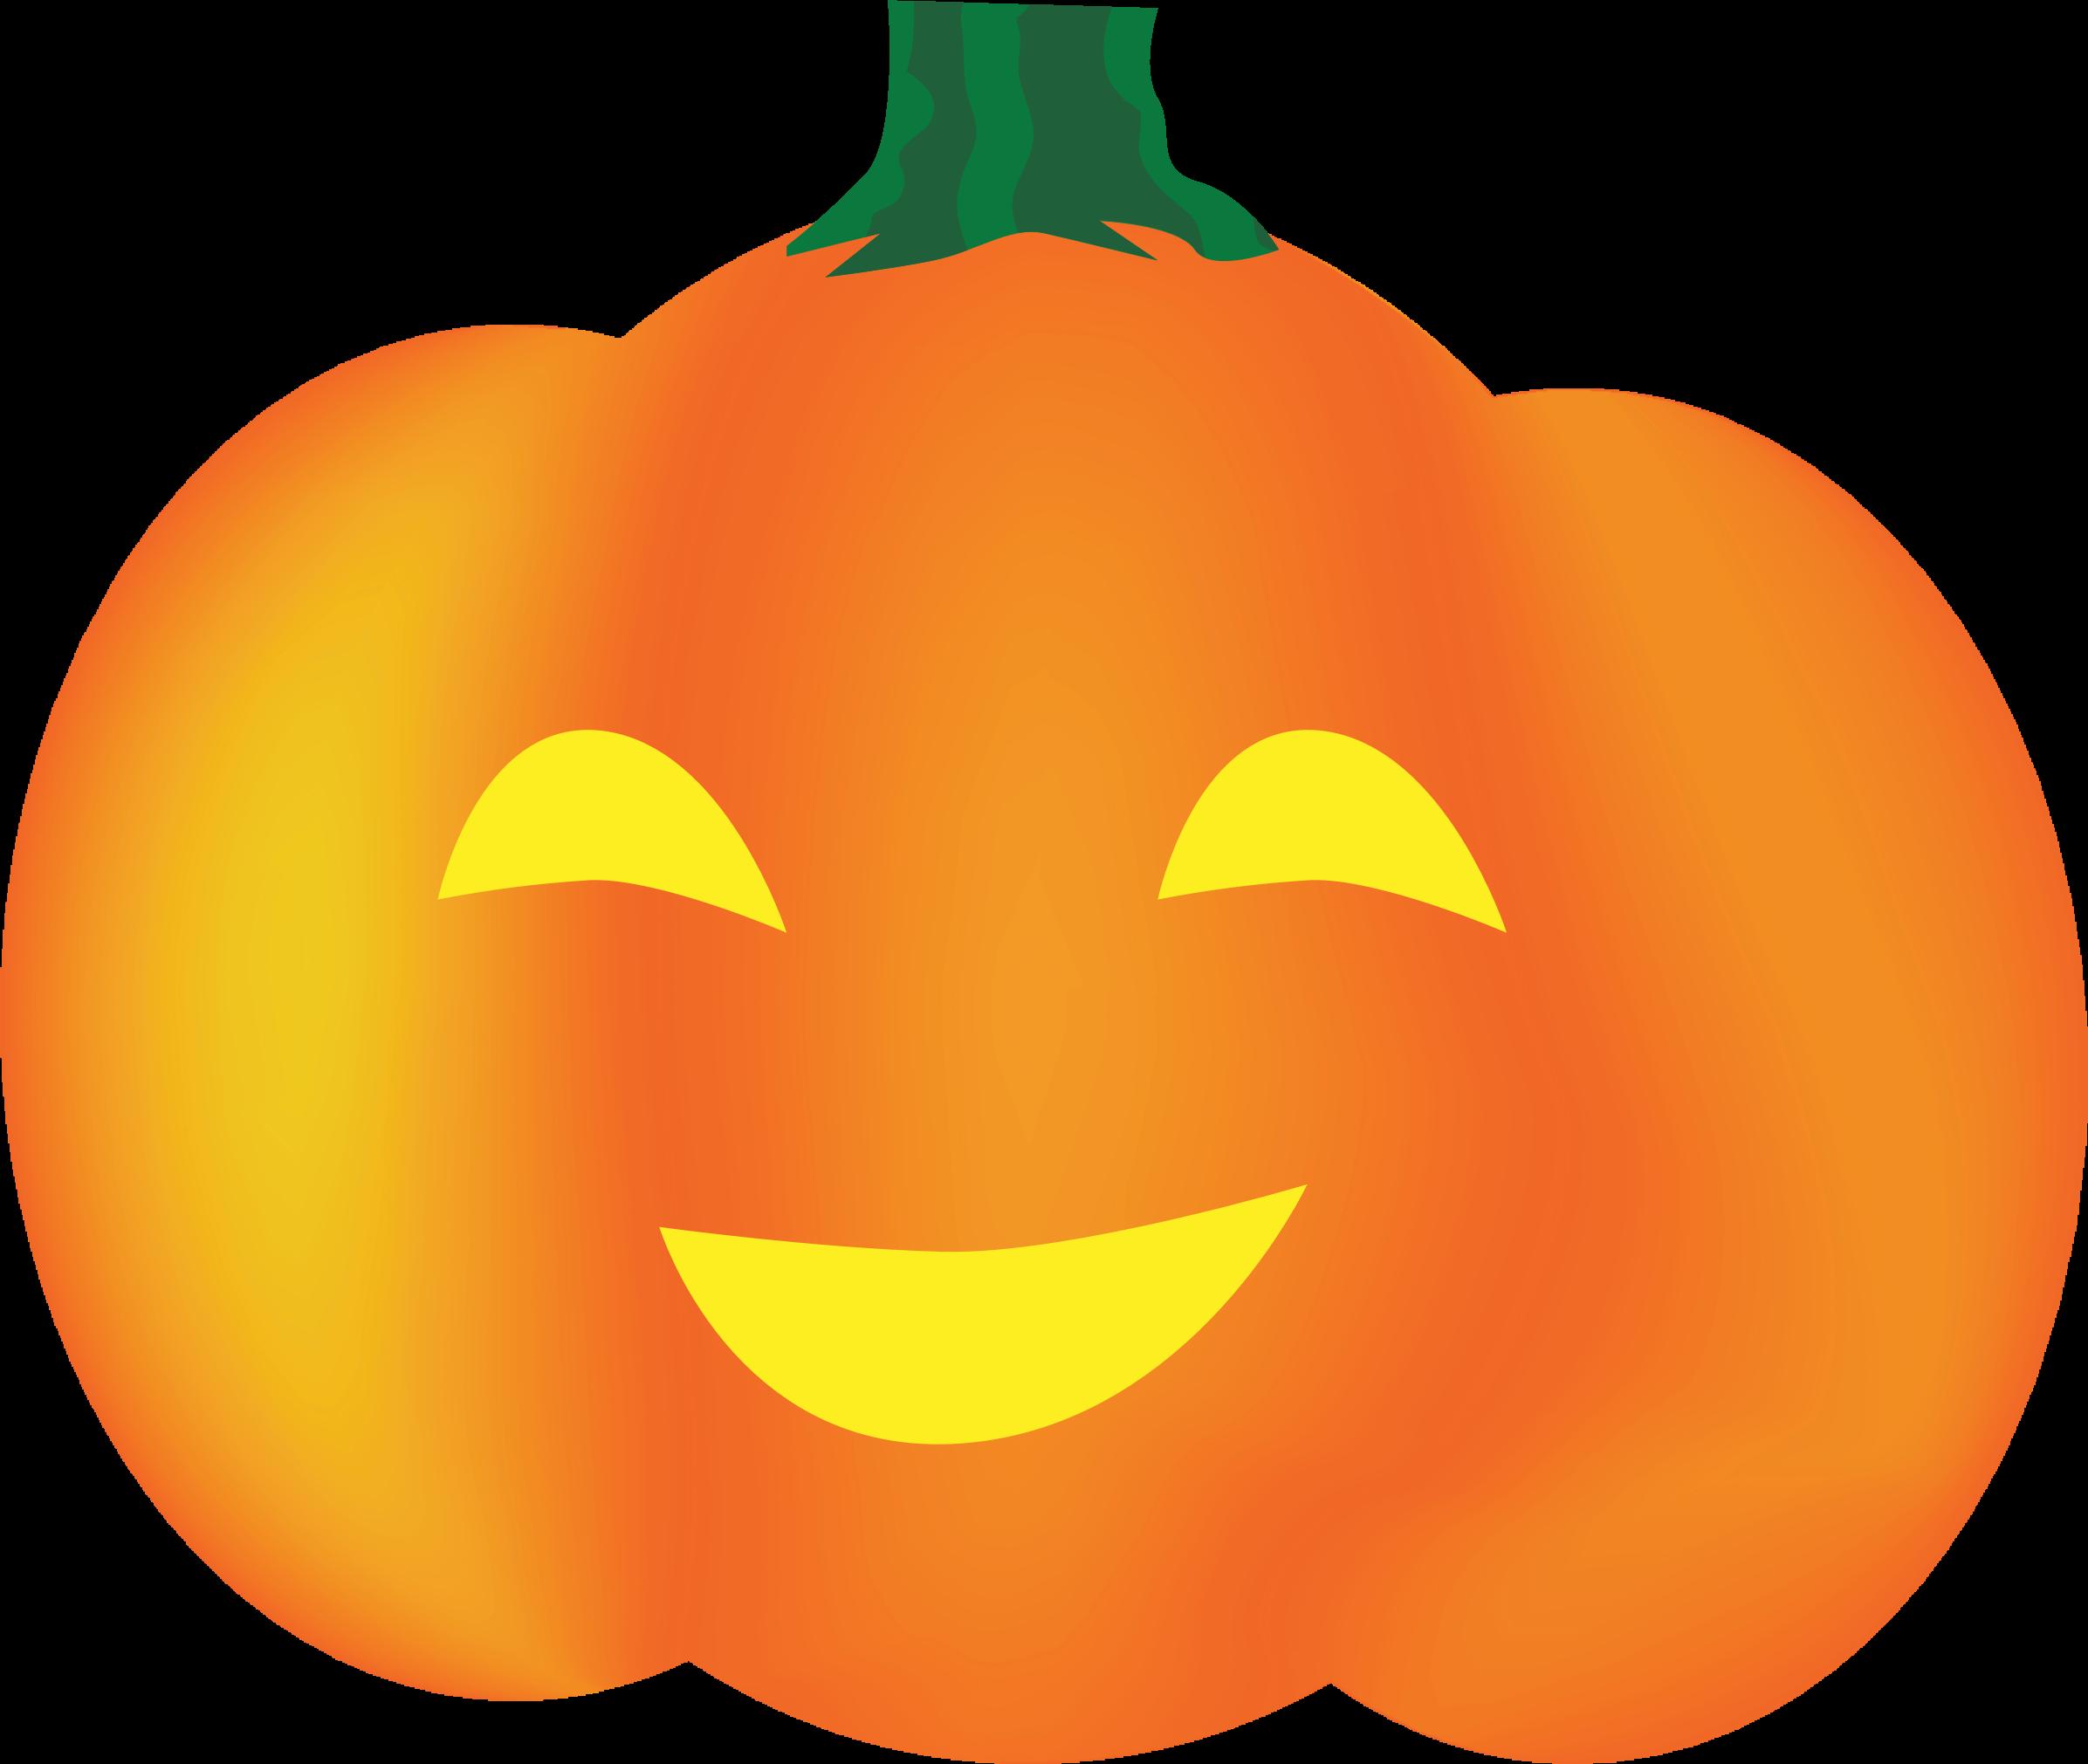 Smiley big image png. Clipart smile pumpkin